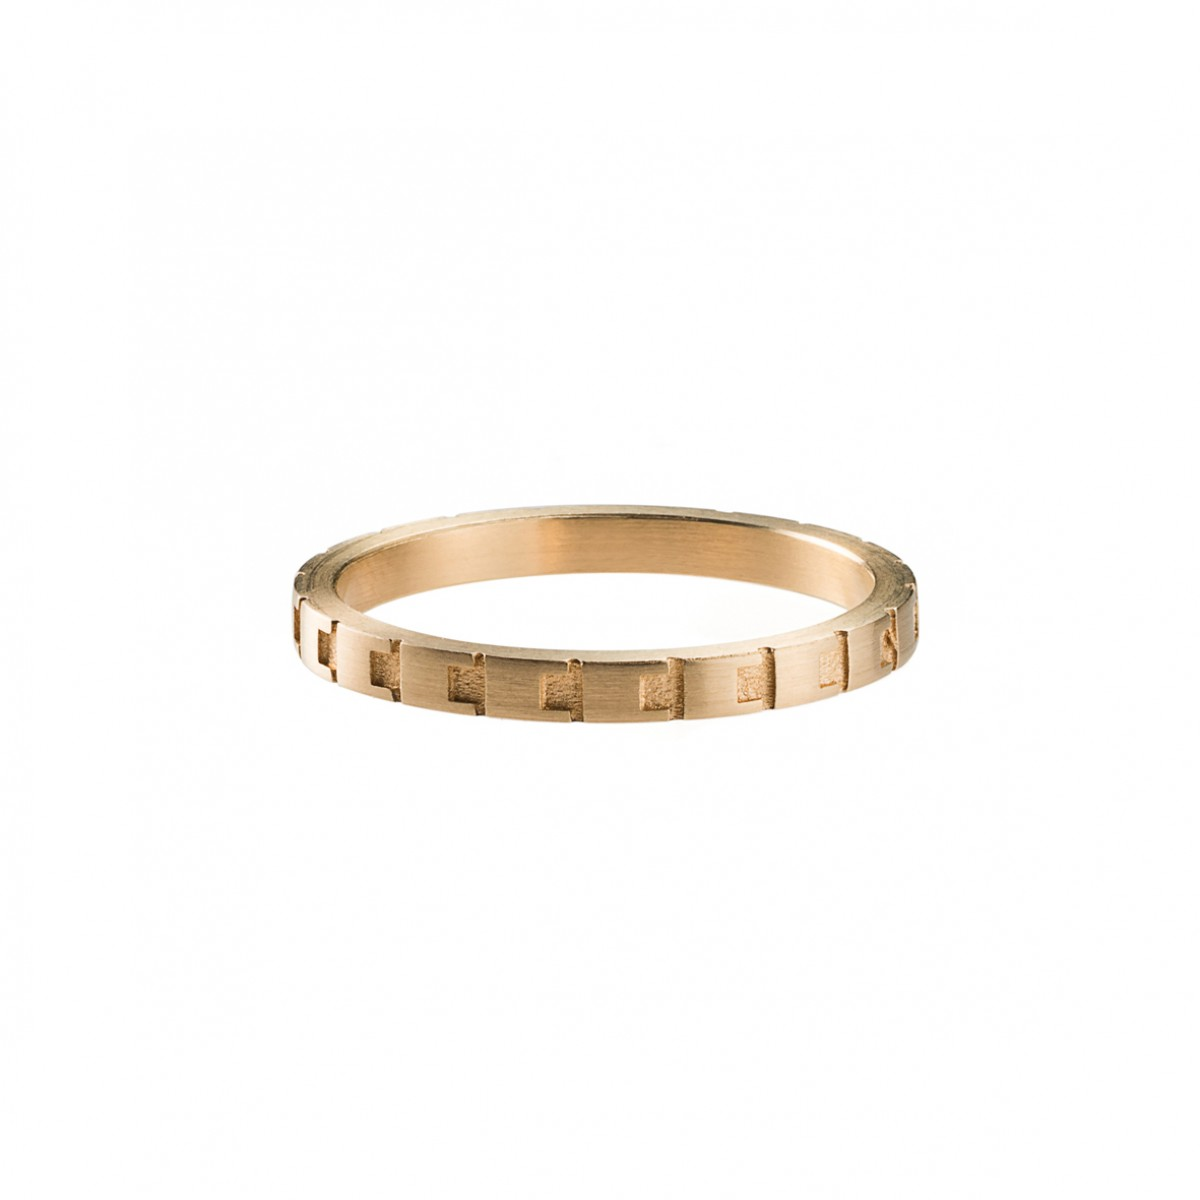 Jasmina Jovy Jewellery Decode! Ring RIDC02 gold